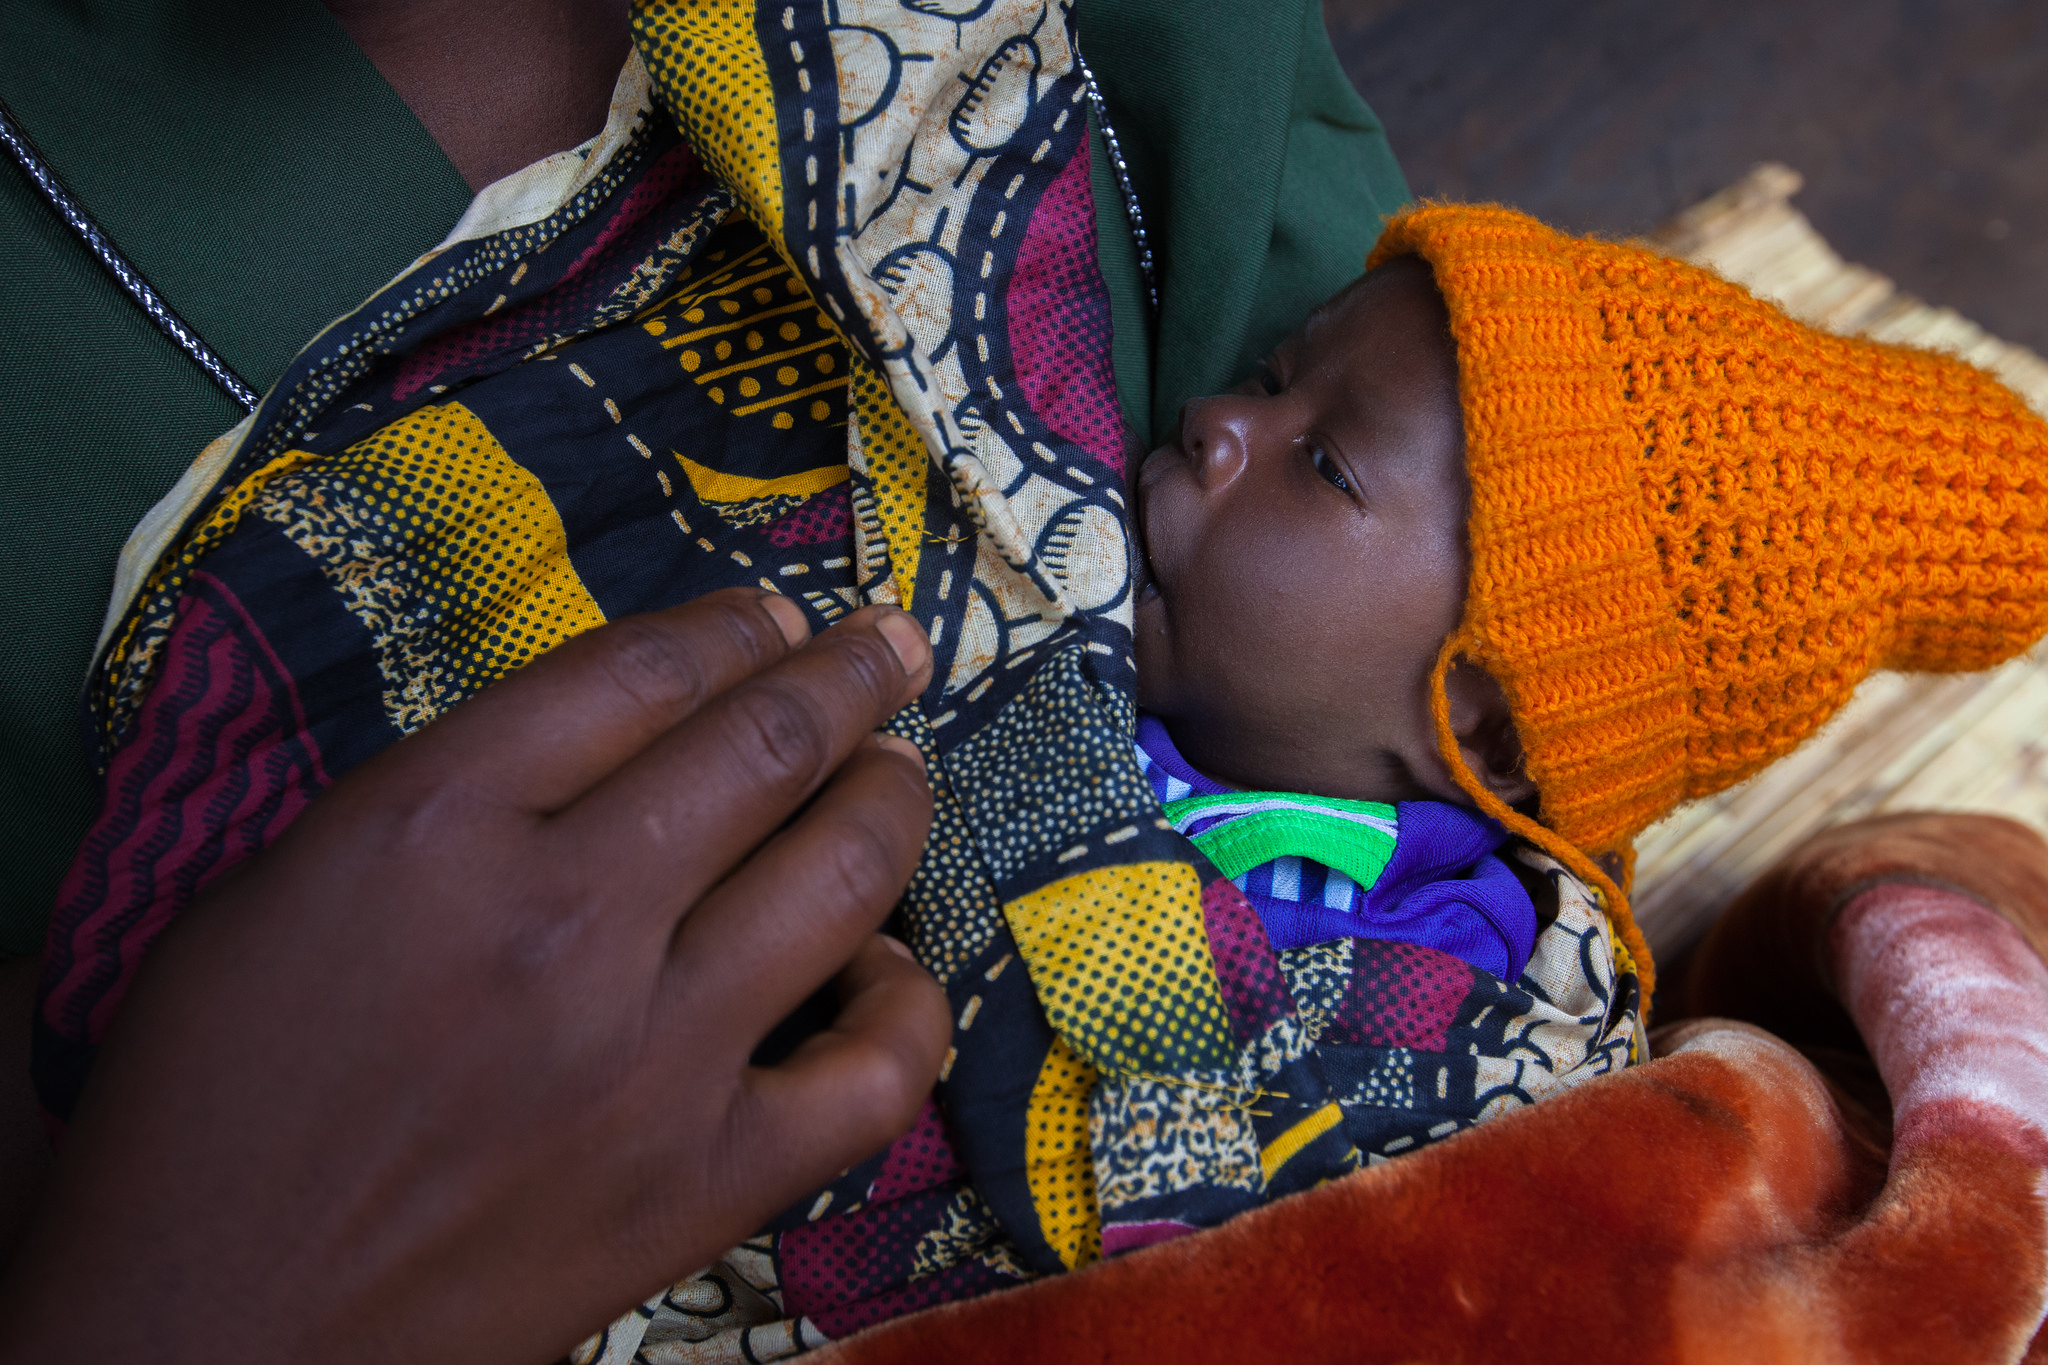 Baby breastfeeding in Malawi. (Courtesy of Guido Dingemans/Jhpiego)